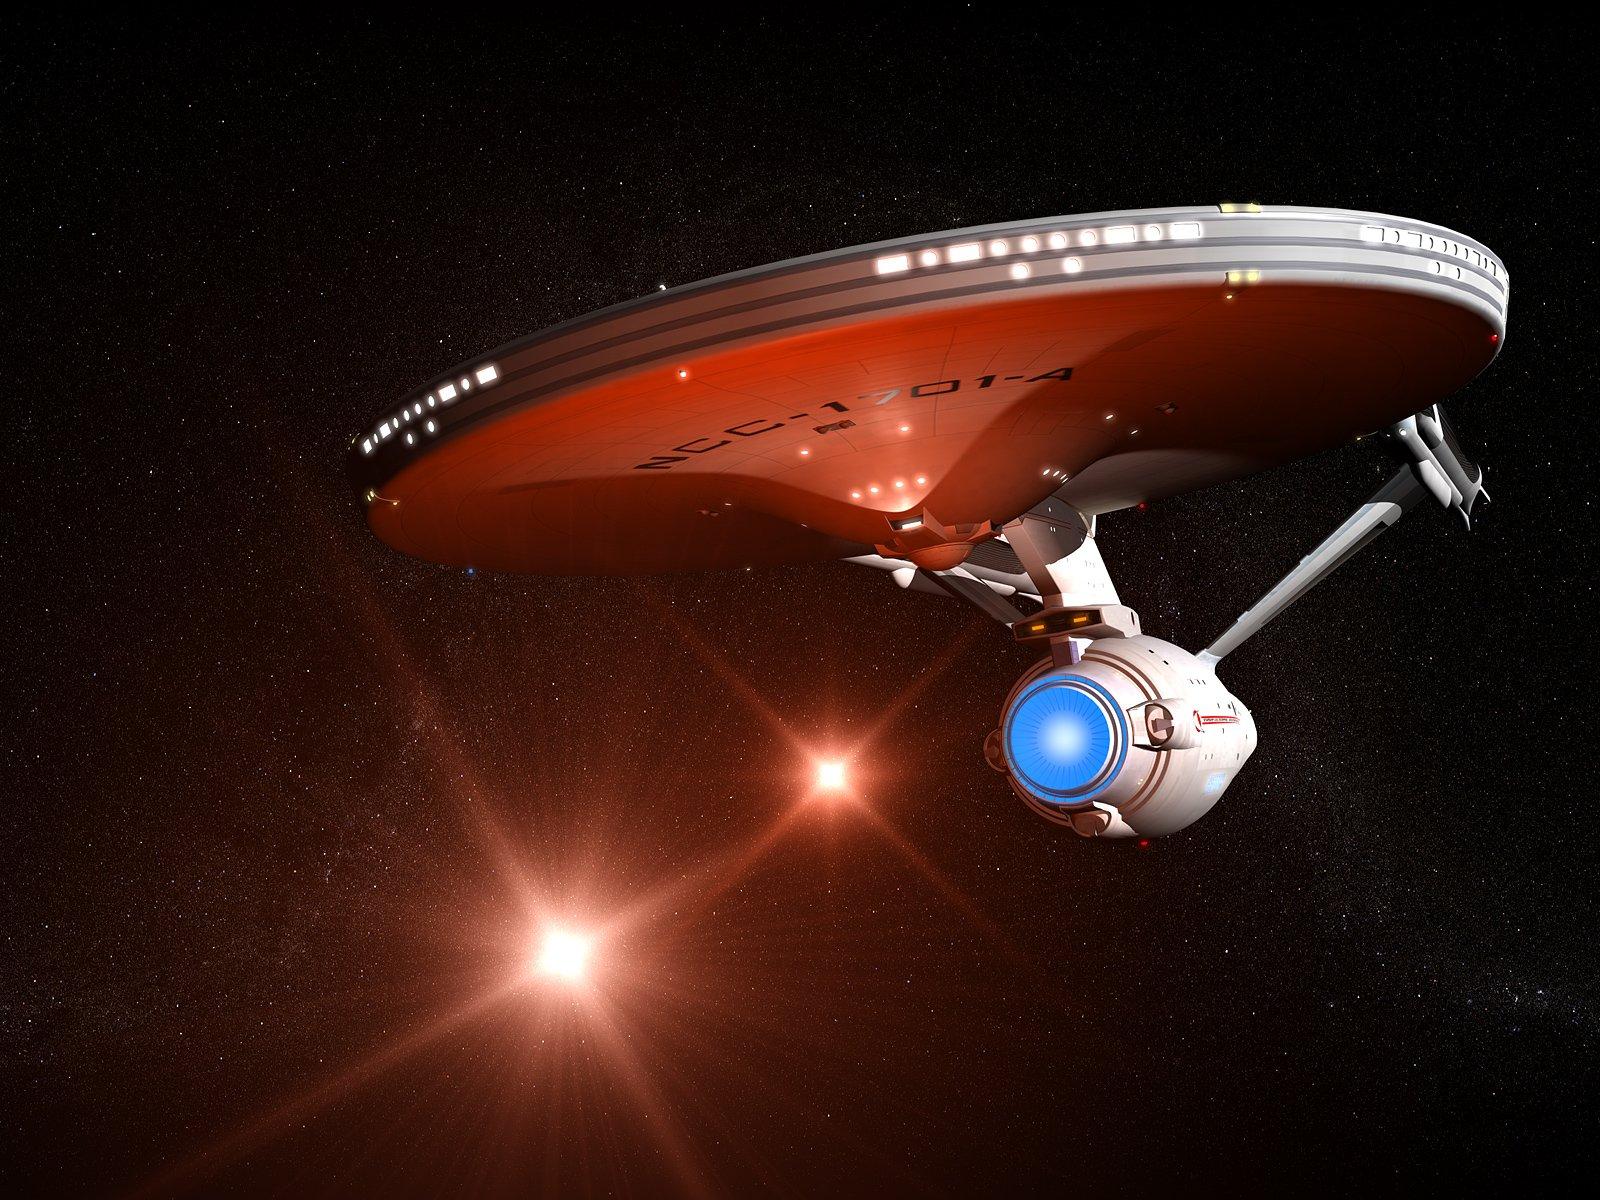 USS Enterprise 1701A Star Trek desktop wallpaper size 1600x1200 1600x1200